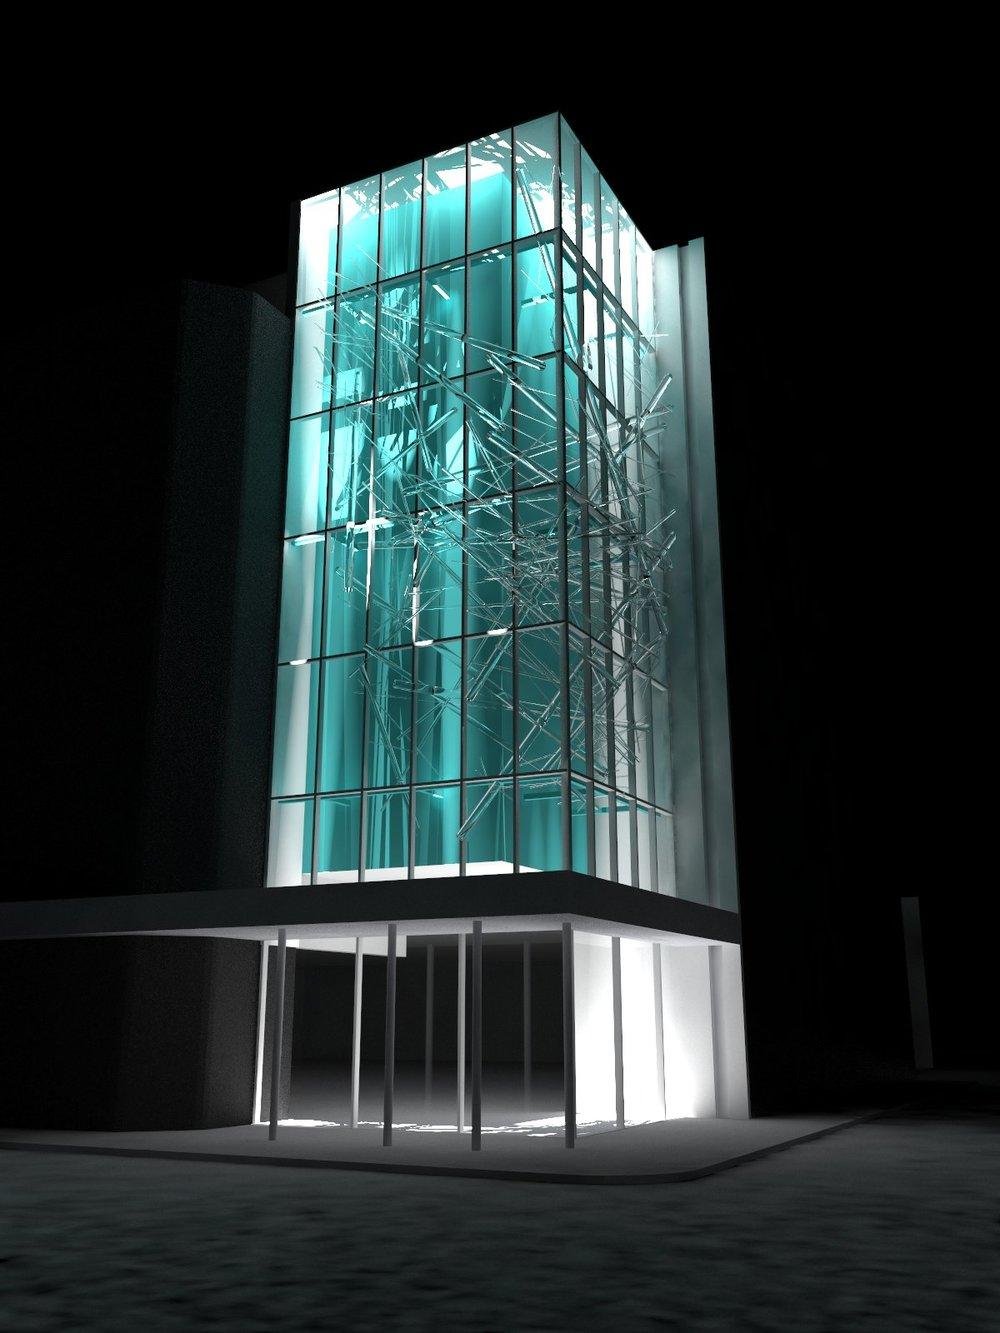 brandon d'leo artist concept rendering